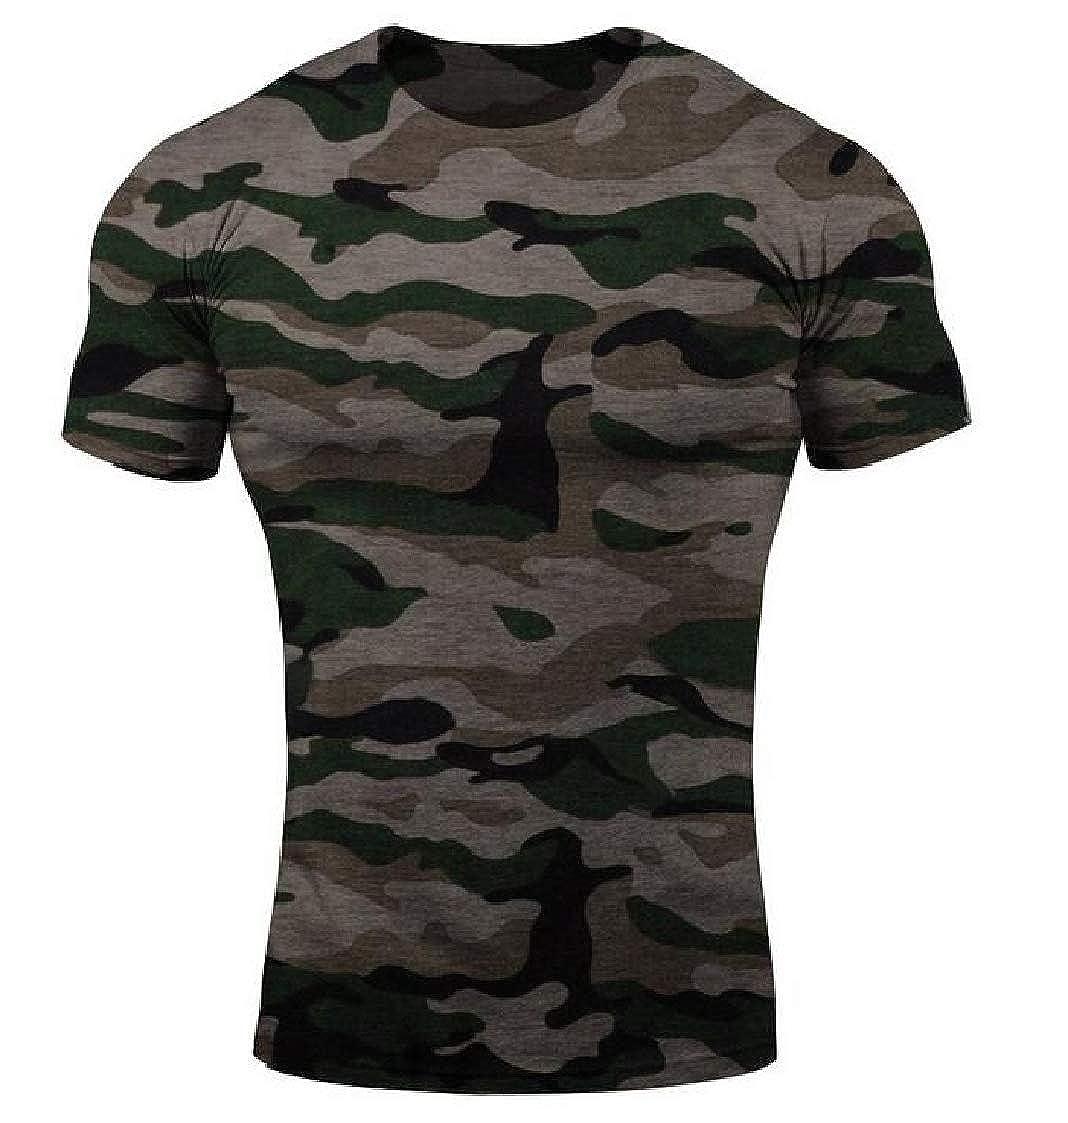 Nanquan Men Running Trainning Fitness Crewneck Camo Short Sleeve Casual T Shirts Tee